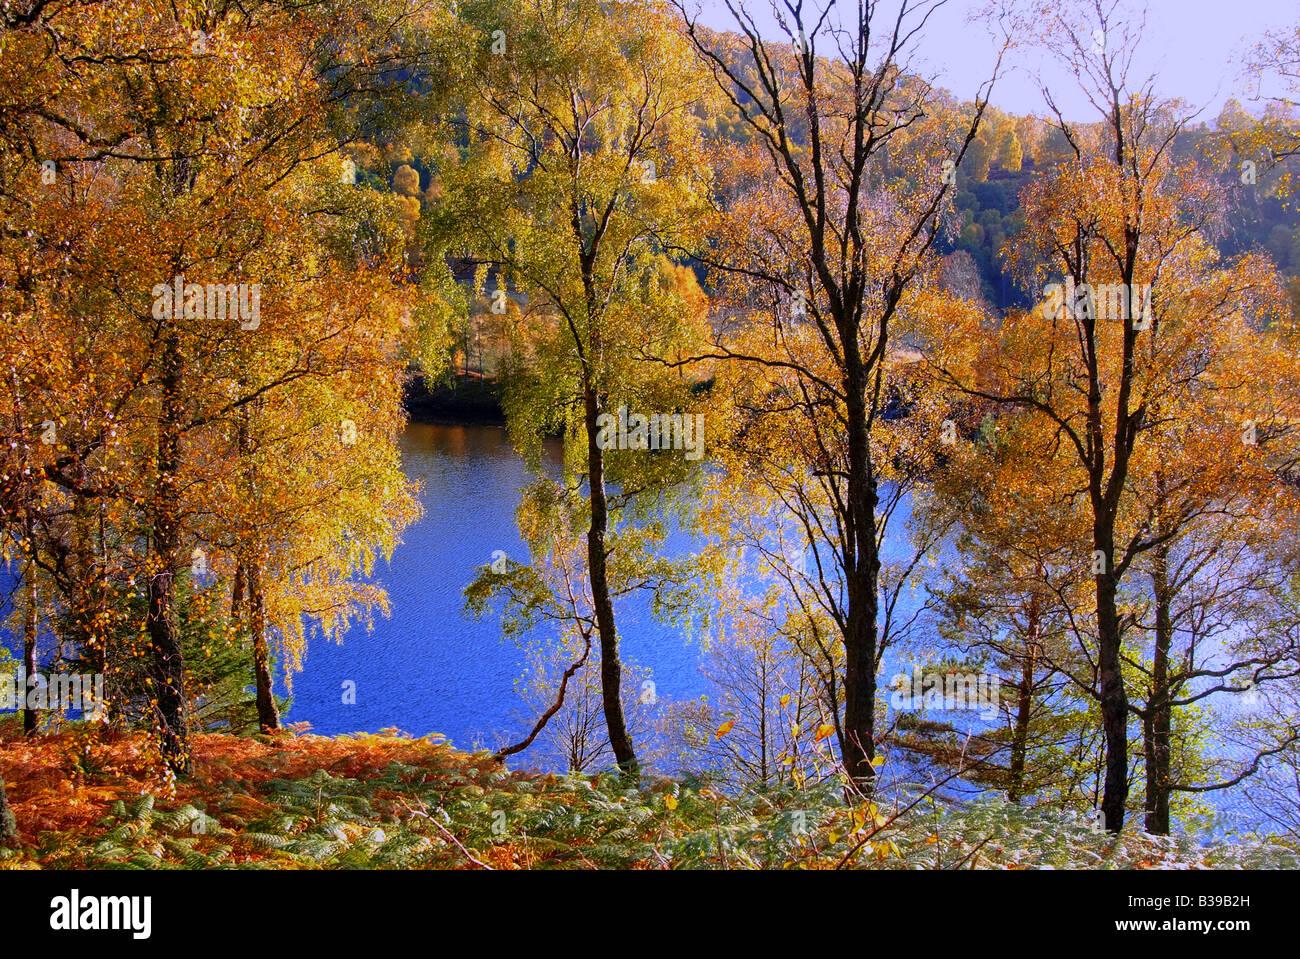 Uk ecosse perthshire tayside silver birch Trees in autumn Loch Tummel Photo Stock